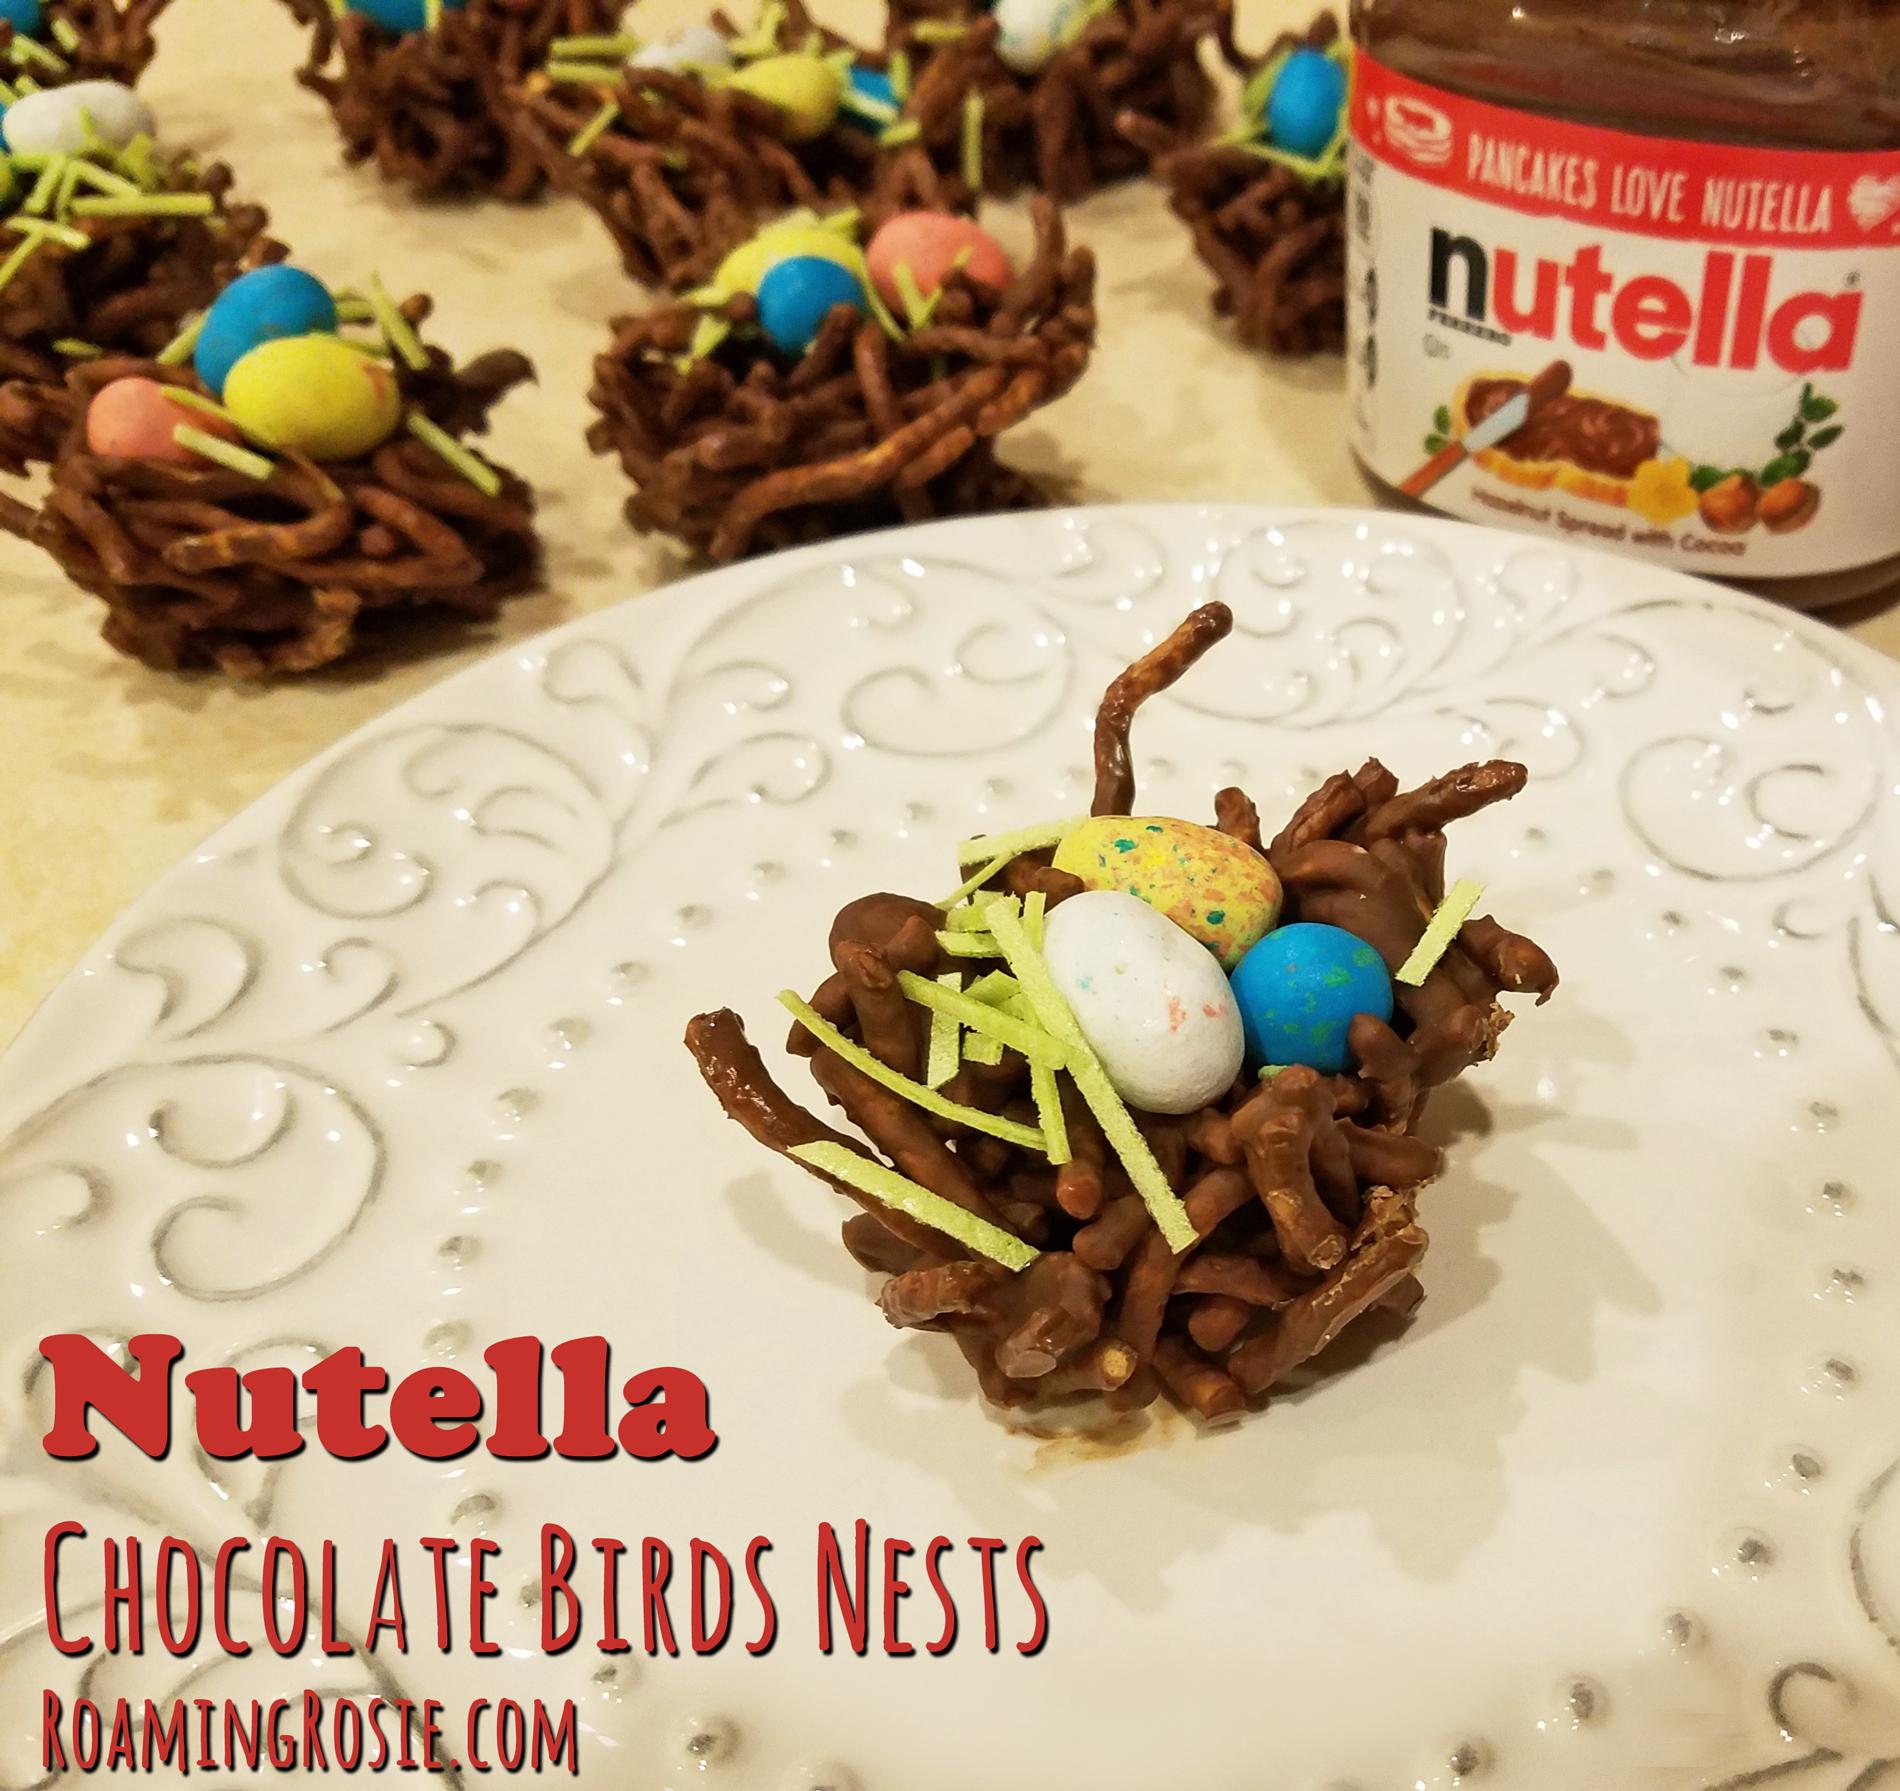 Nutella Chocolate Birds Nests 7